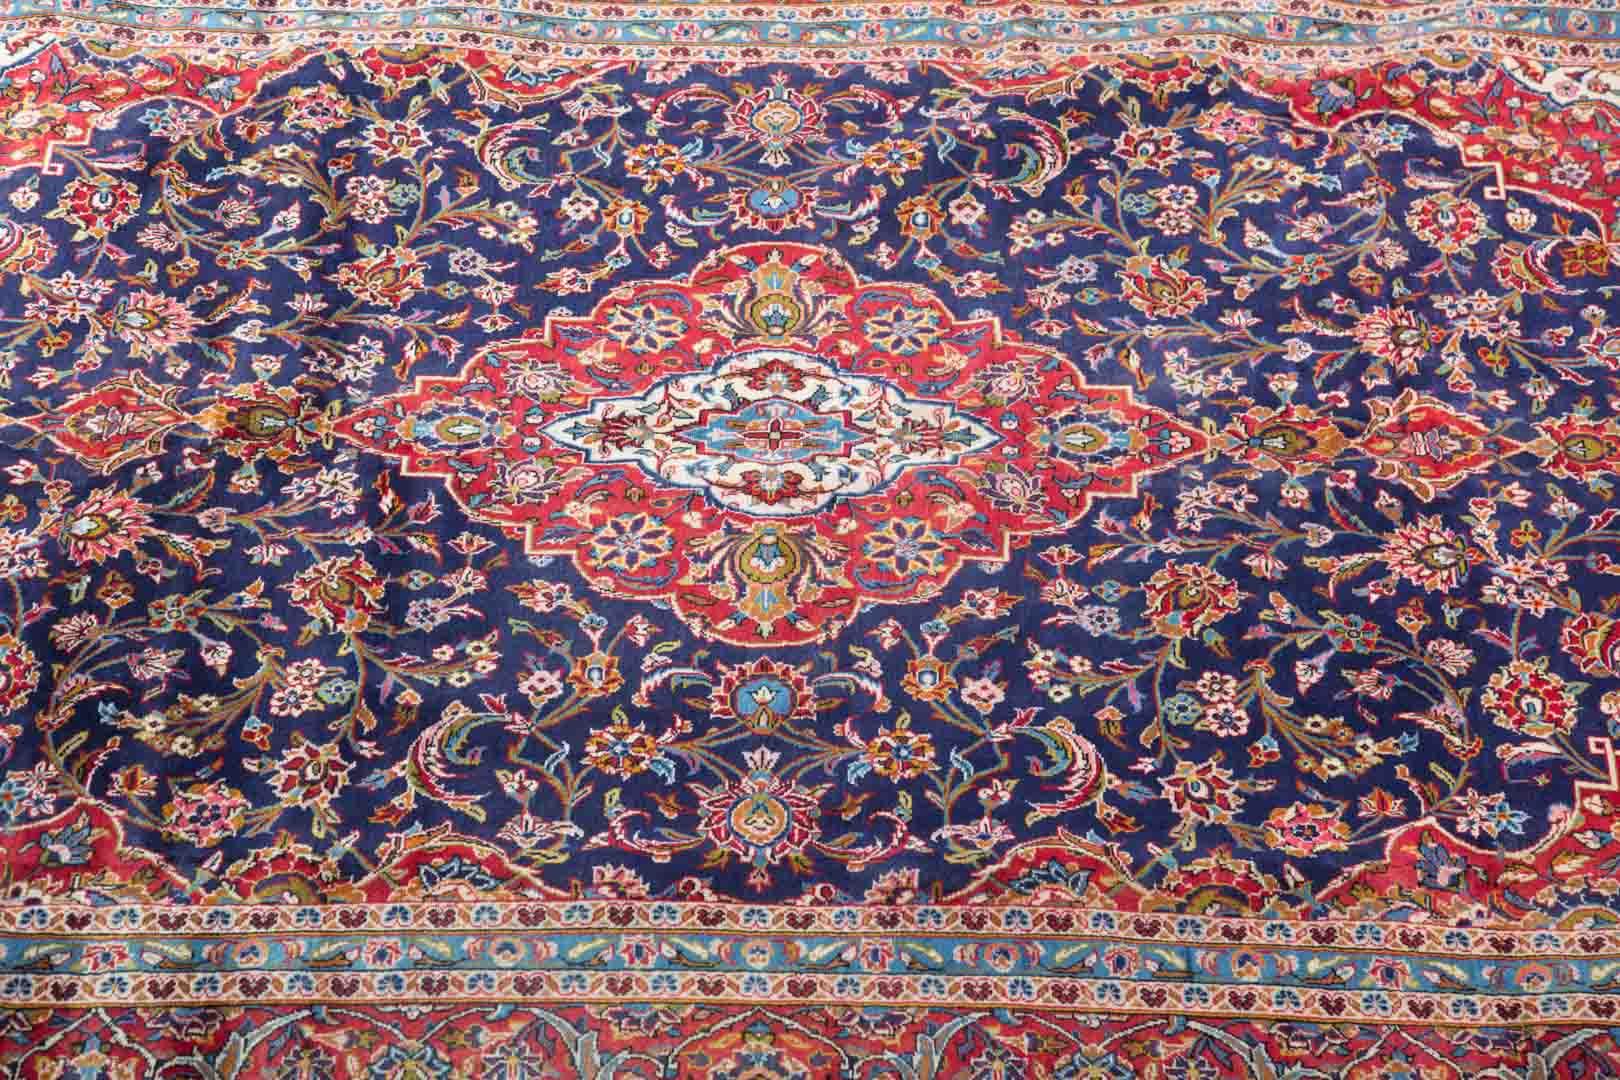 Persian Kashan Rug approx 8x12.6 Image